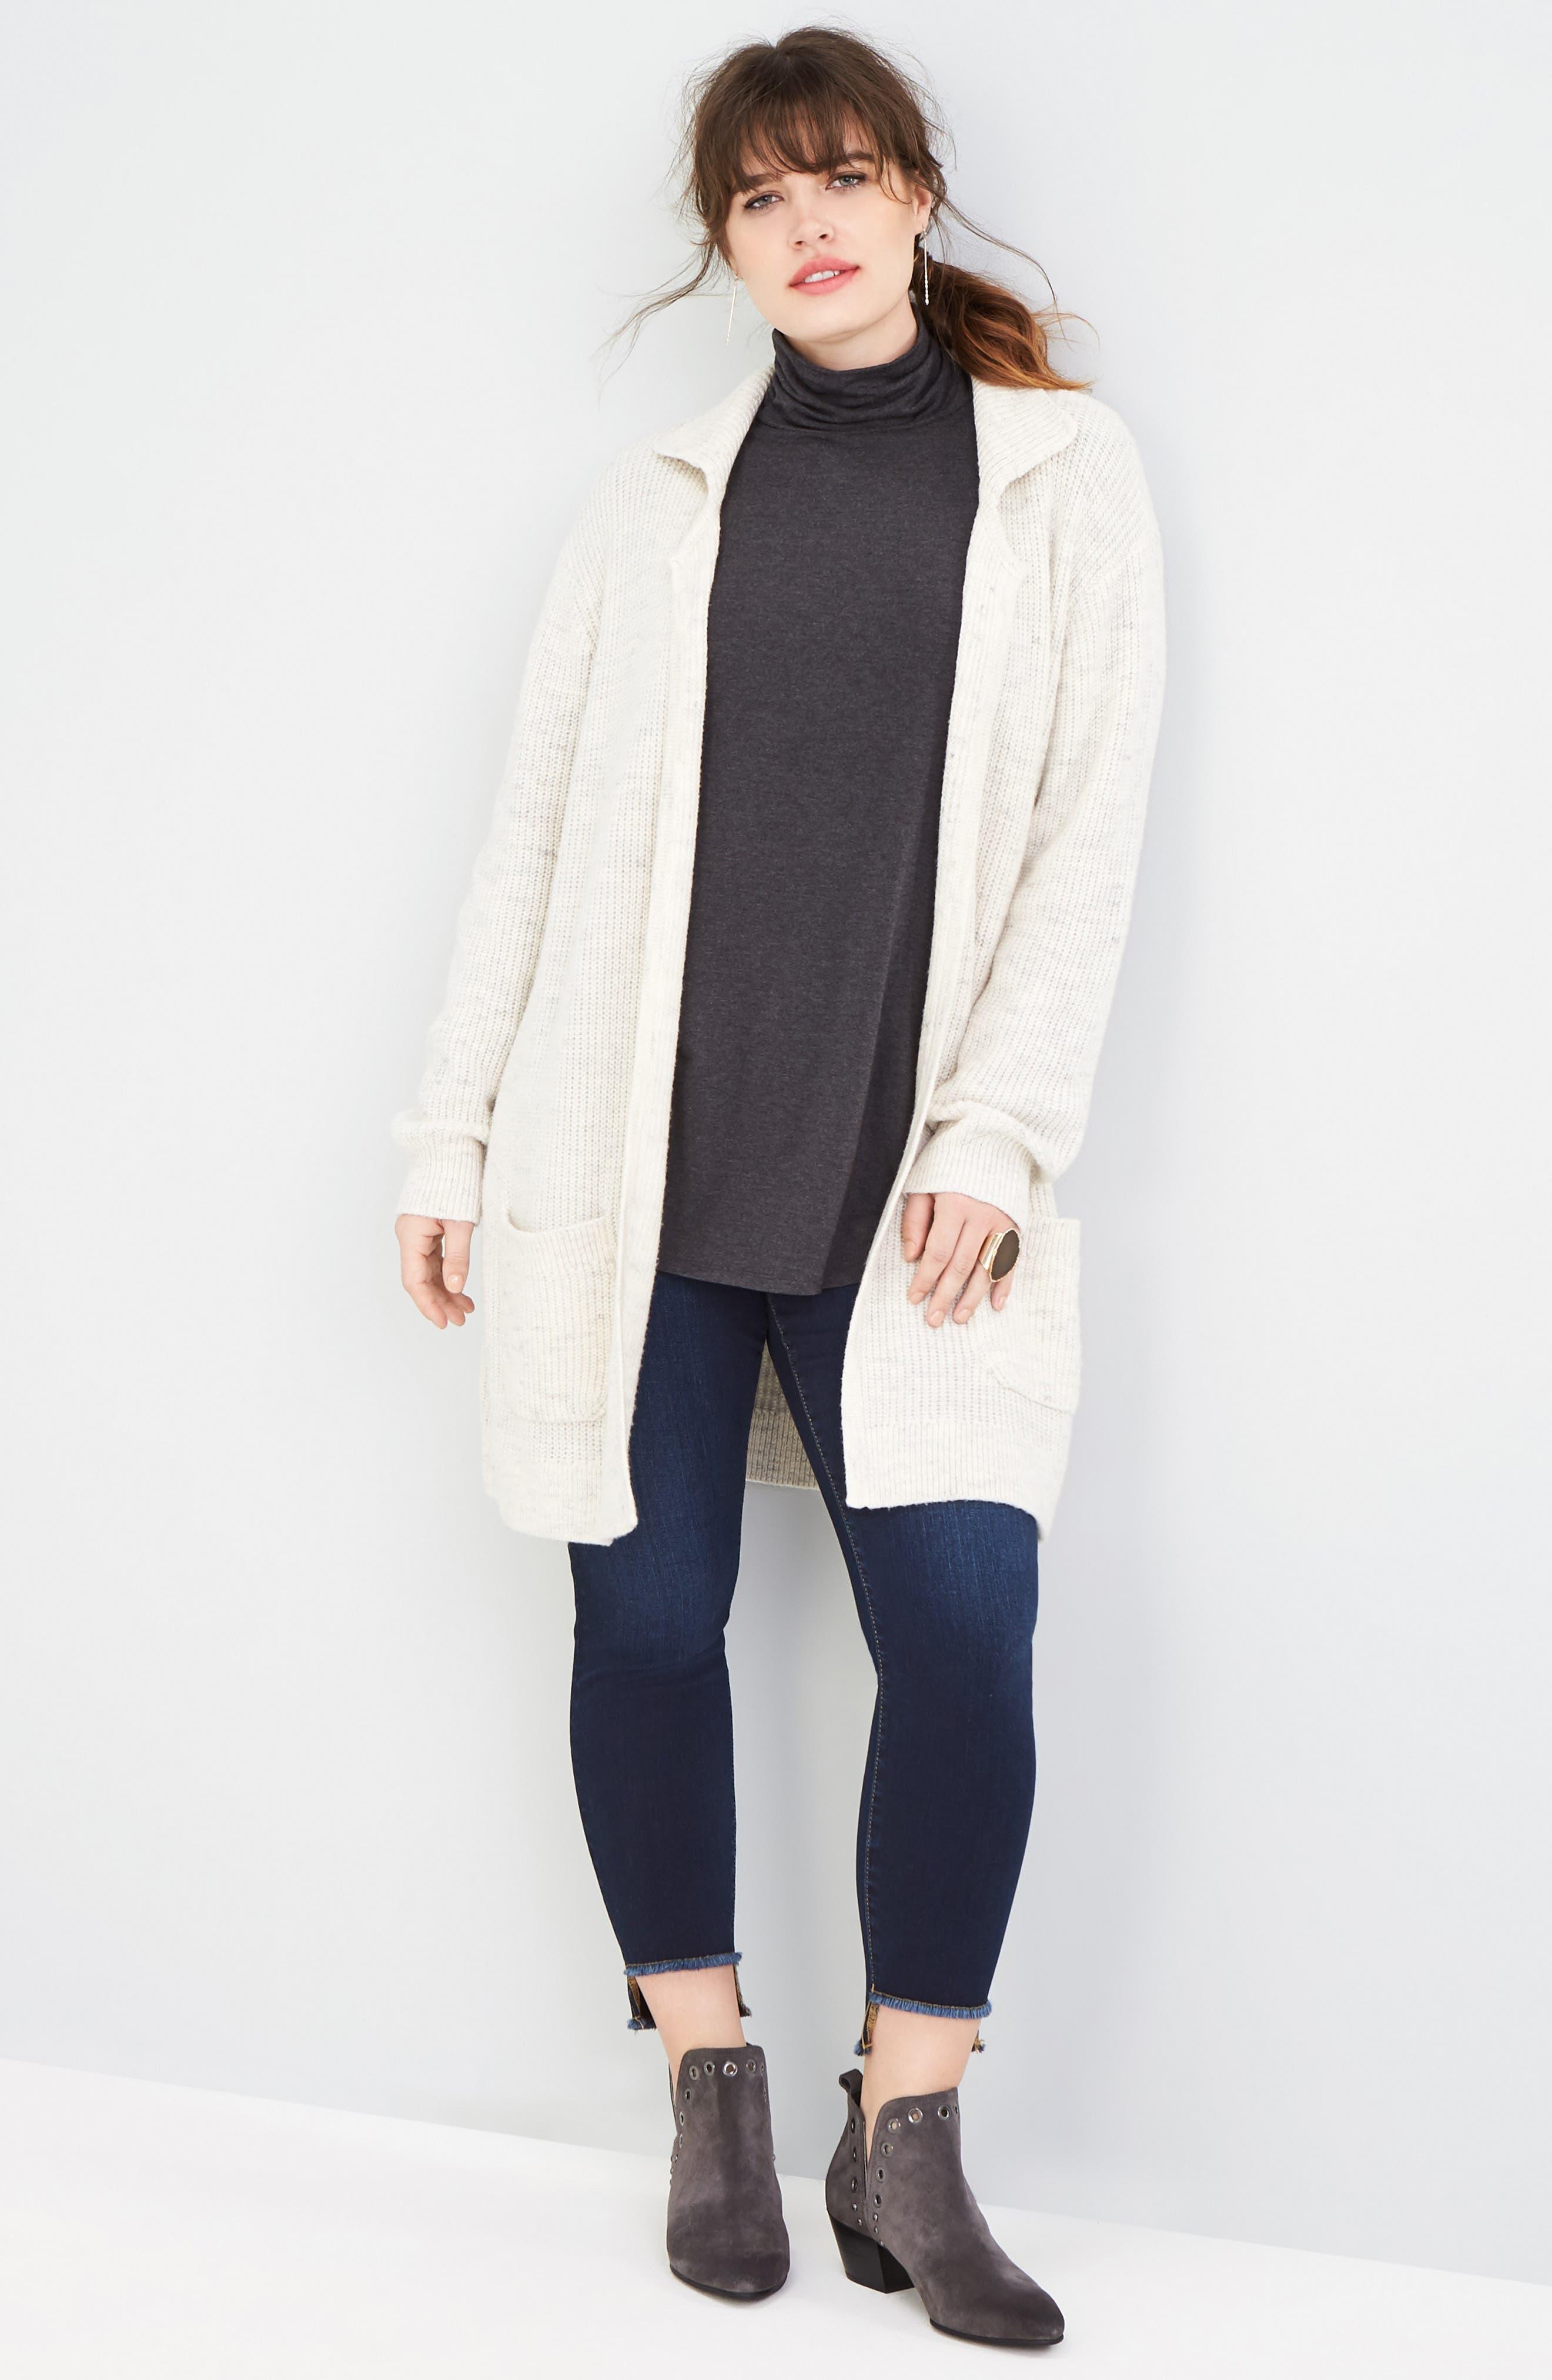 SLINK JEANS 'The Skinny' Stretch Denim Jeans, Main, color, AMBER